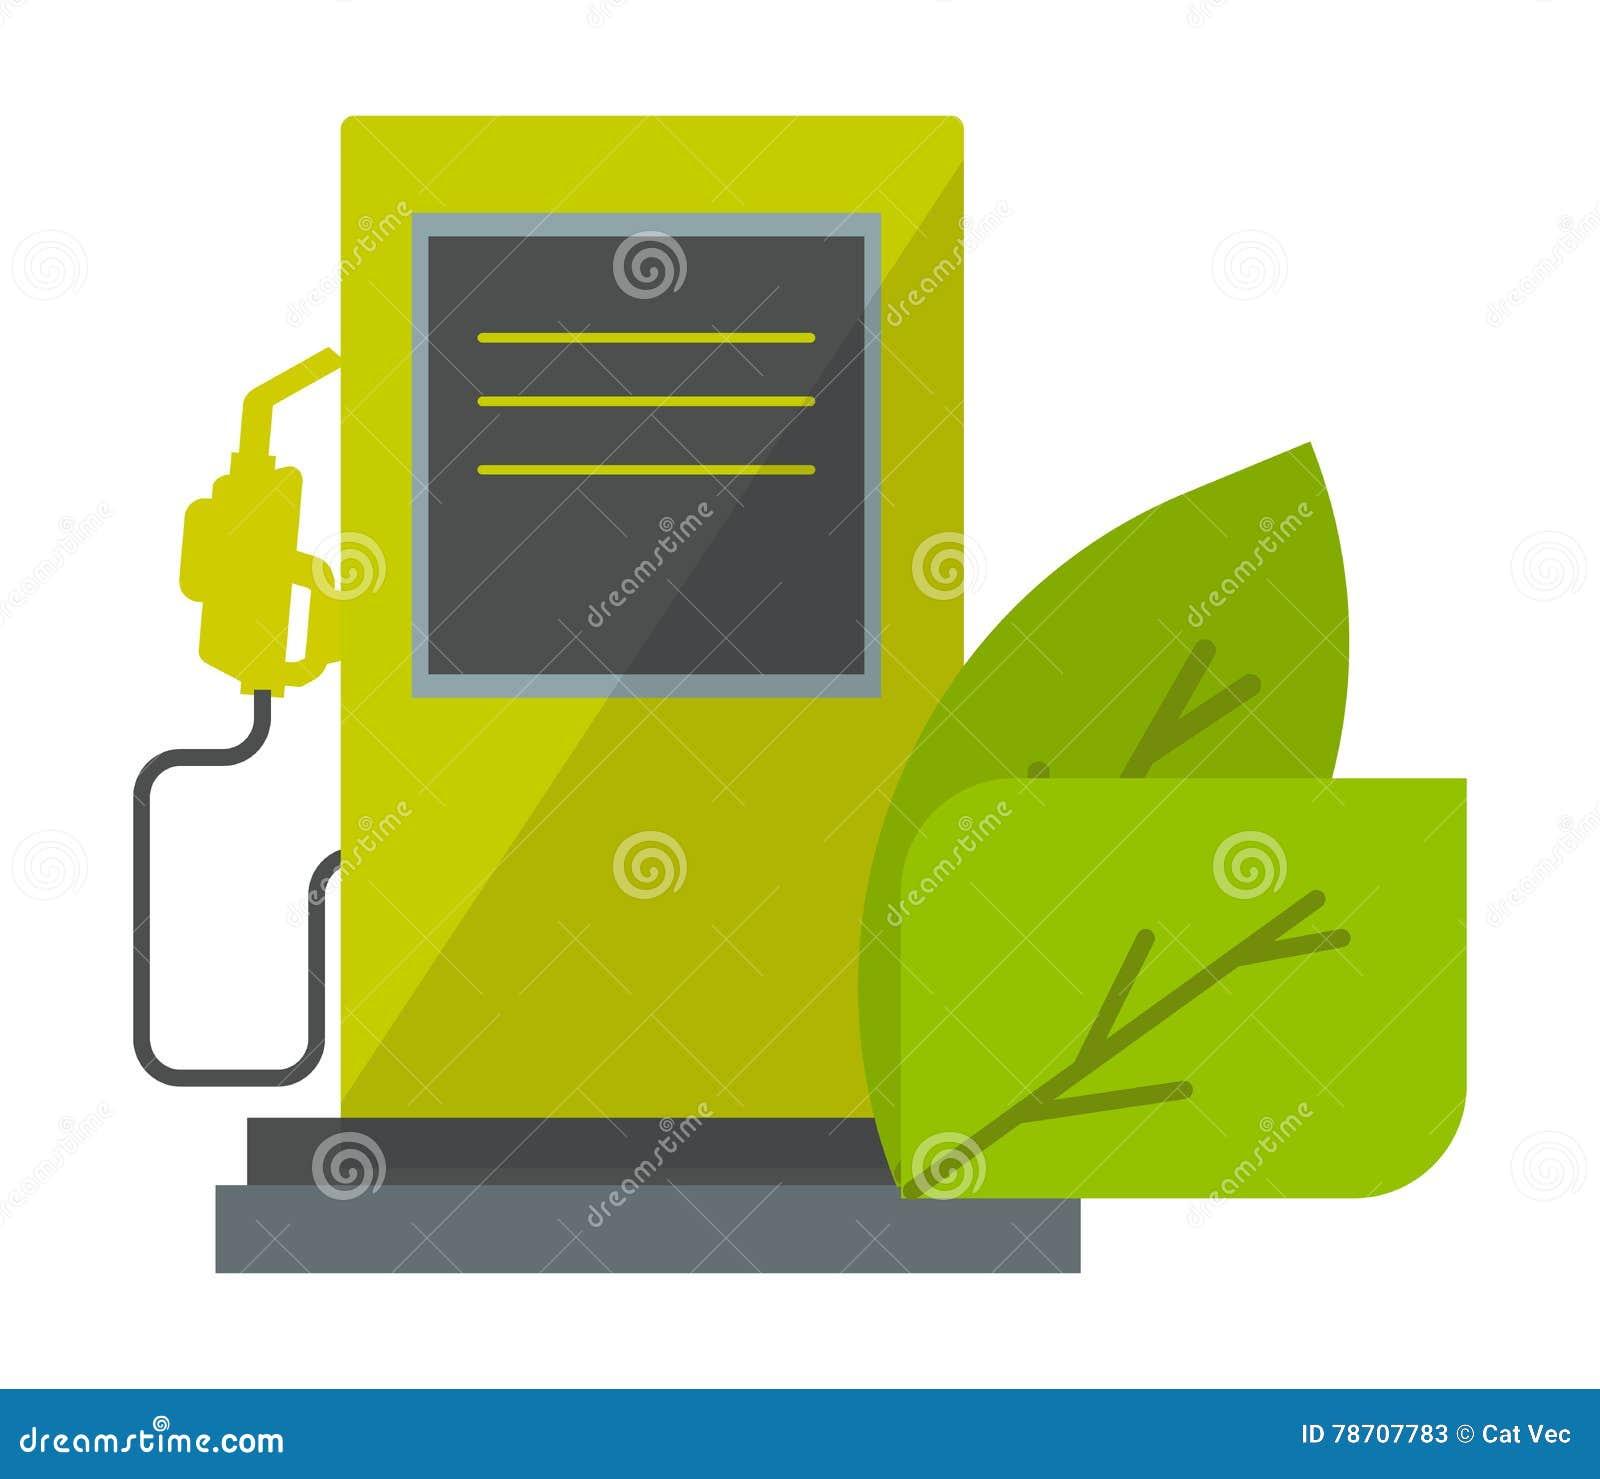 Green Energy Icon Vector Illustration Stock Oil Power Plant Diagram Ecology Industrial Petroleum Concept Nature Symbol Production Pollution Liquid